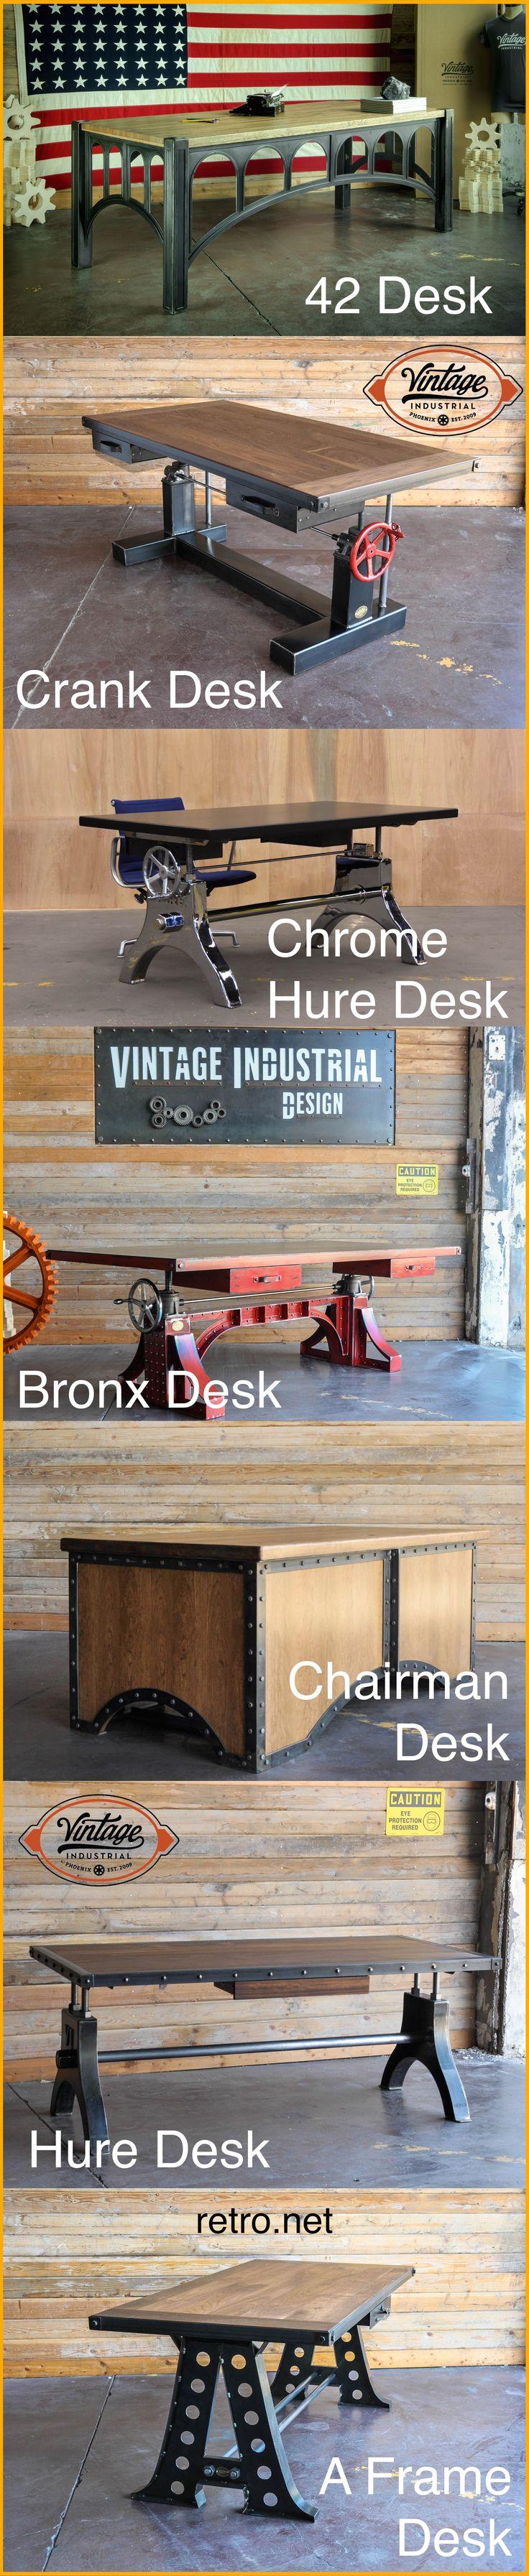 81 best Rustic Industrial & Loft images on Pinterest